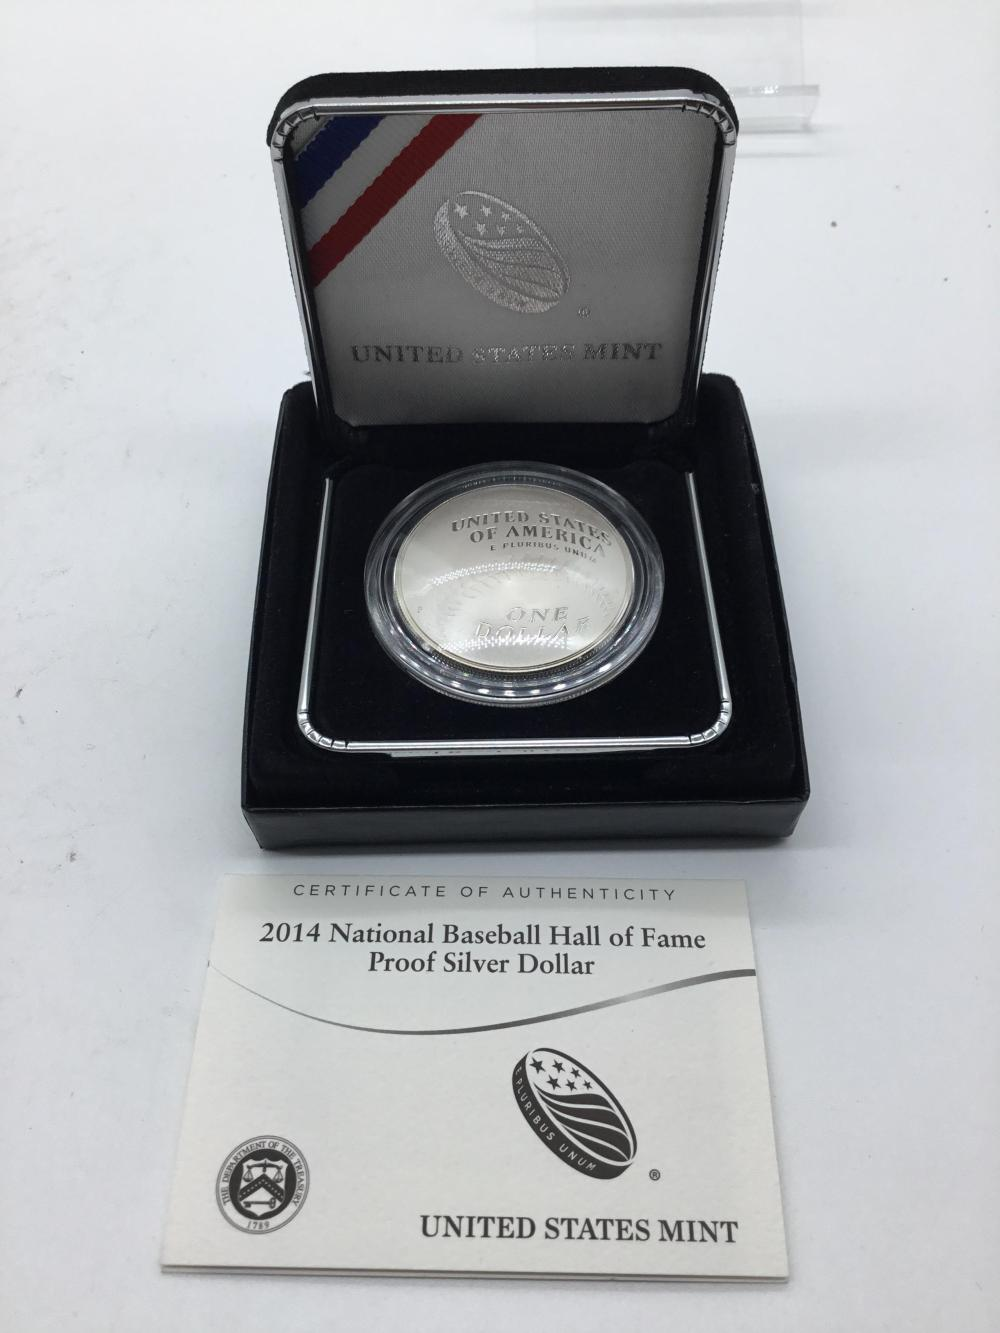 Baseball Hall of Fame silver proof dollar